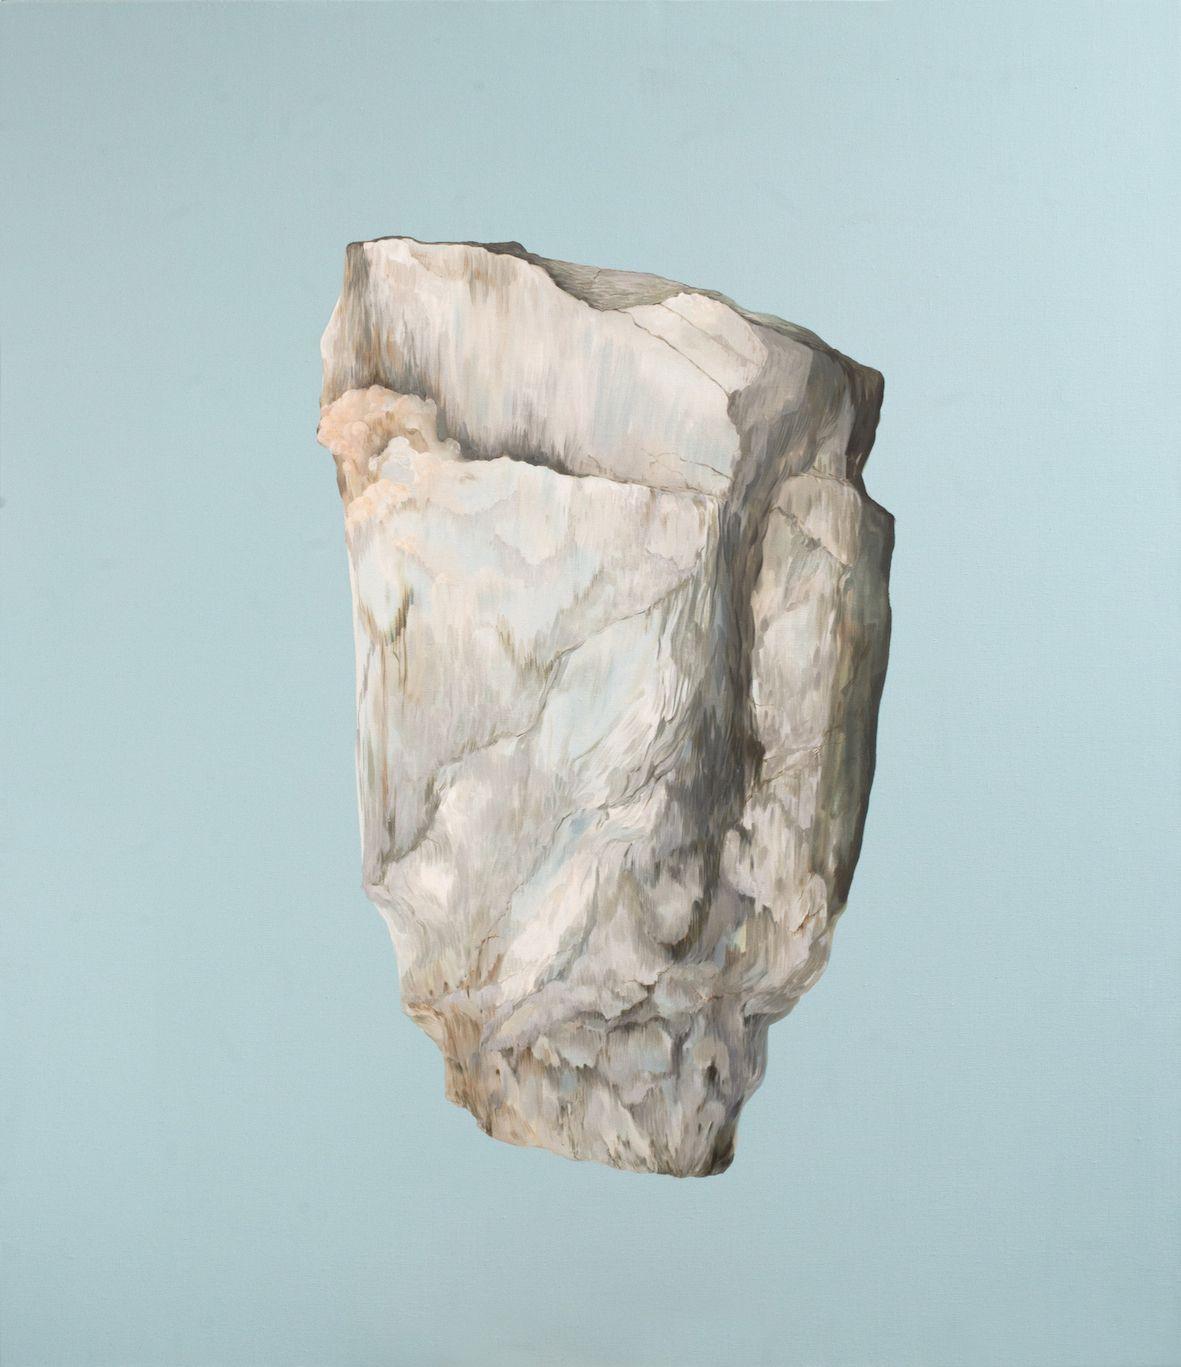 adsm-100x115-siderale-serie-vanites-hybridese_acrylique_et_huile_sur_toile__2016-300dpi-256d5f13cfc4d3ca2fae7e1645f1a256